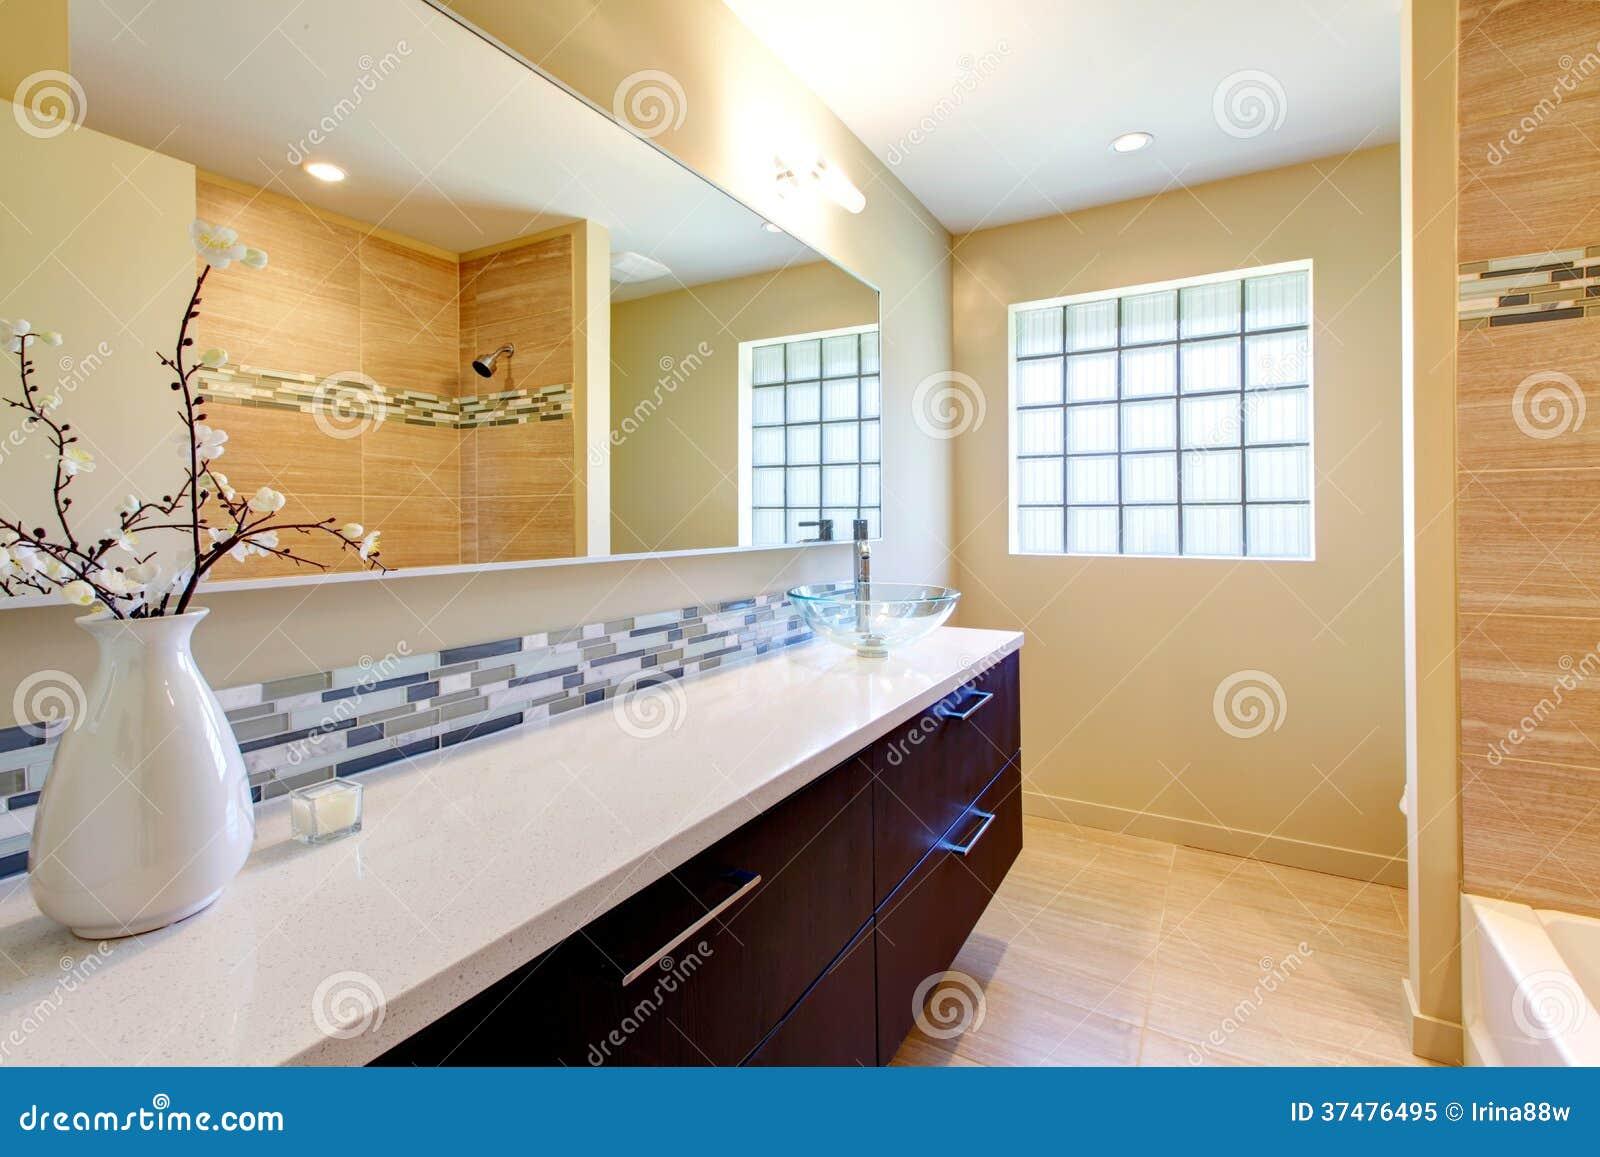 Salle De Bain Lumineuse Design ~ salle de bains lumineuse l gante image stock image du bathroom